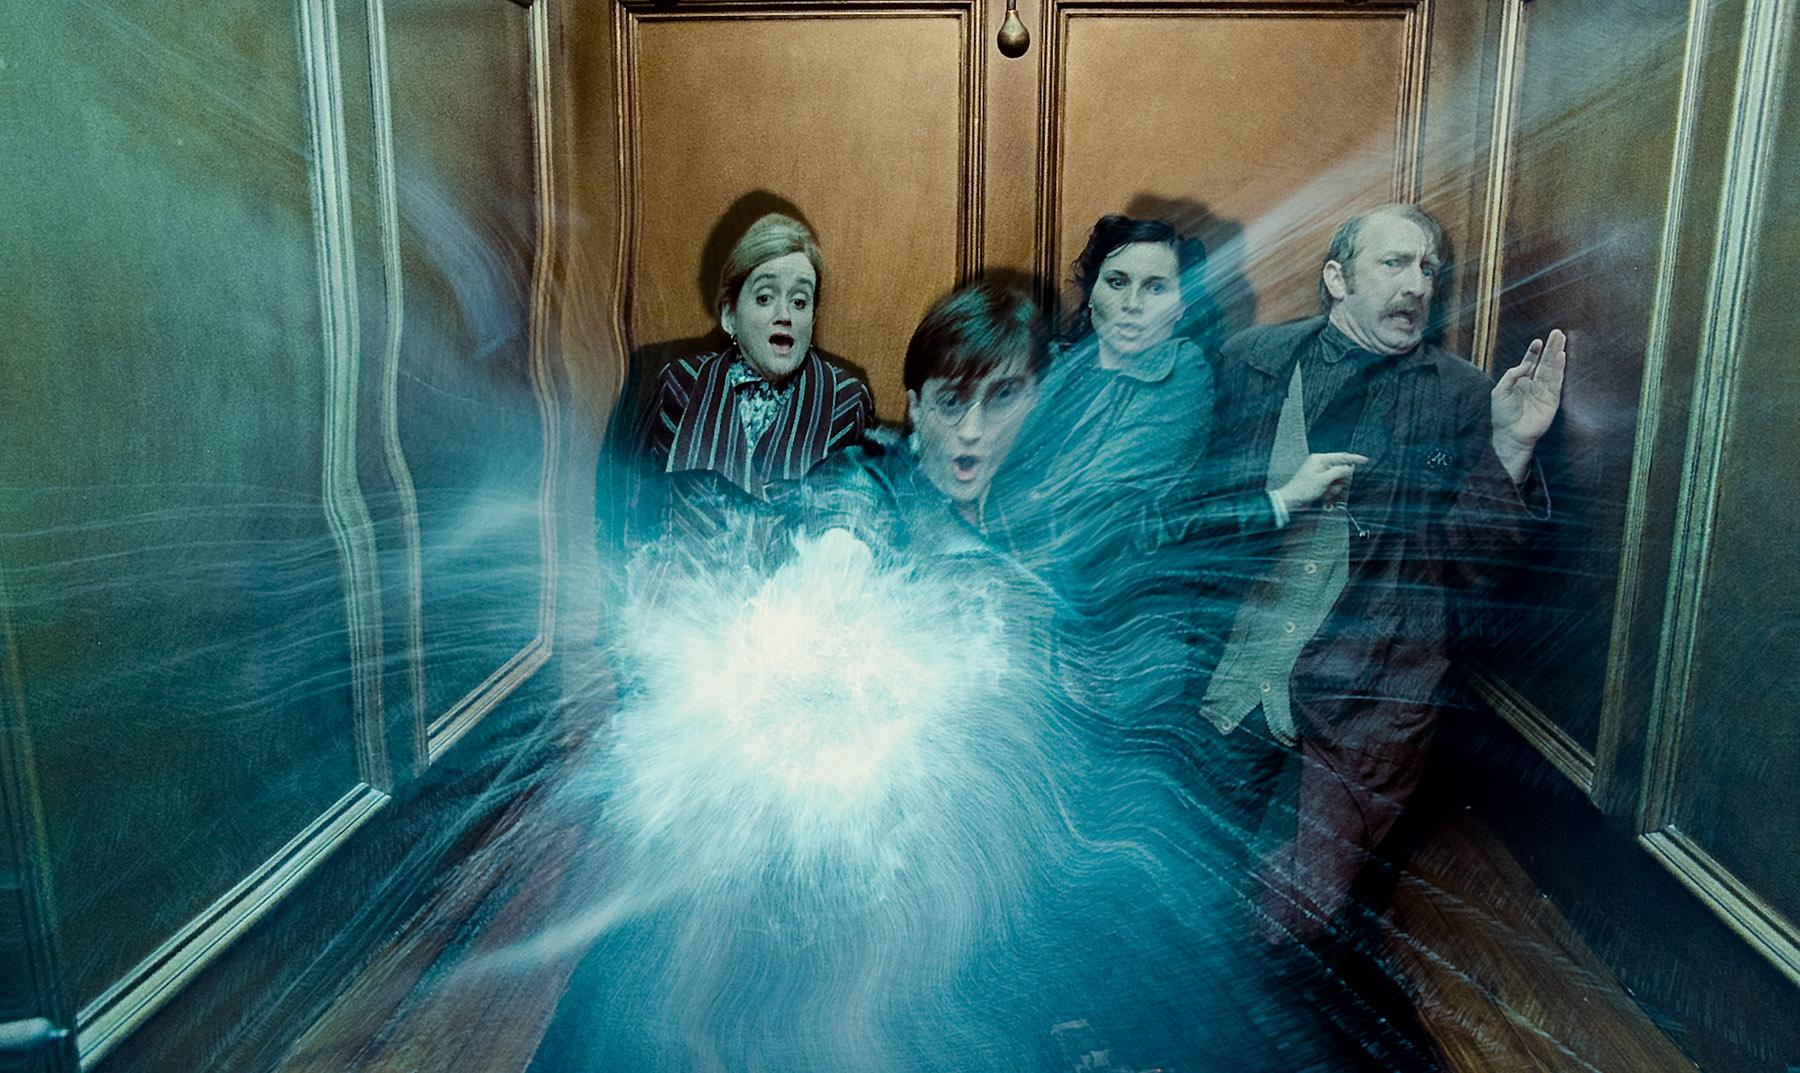 Voldemort Iphone Wallpaper Harry Potter Spell Casting Desktop Wallpaper